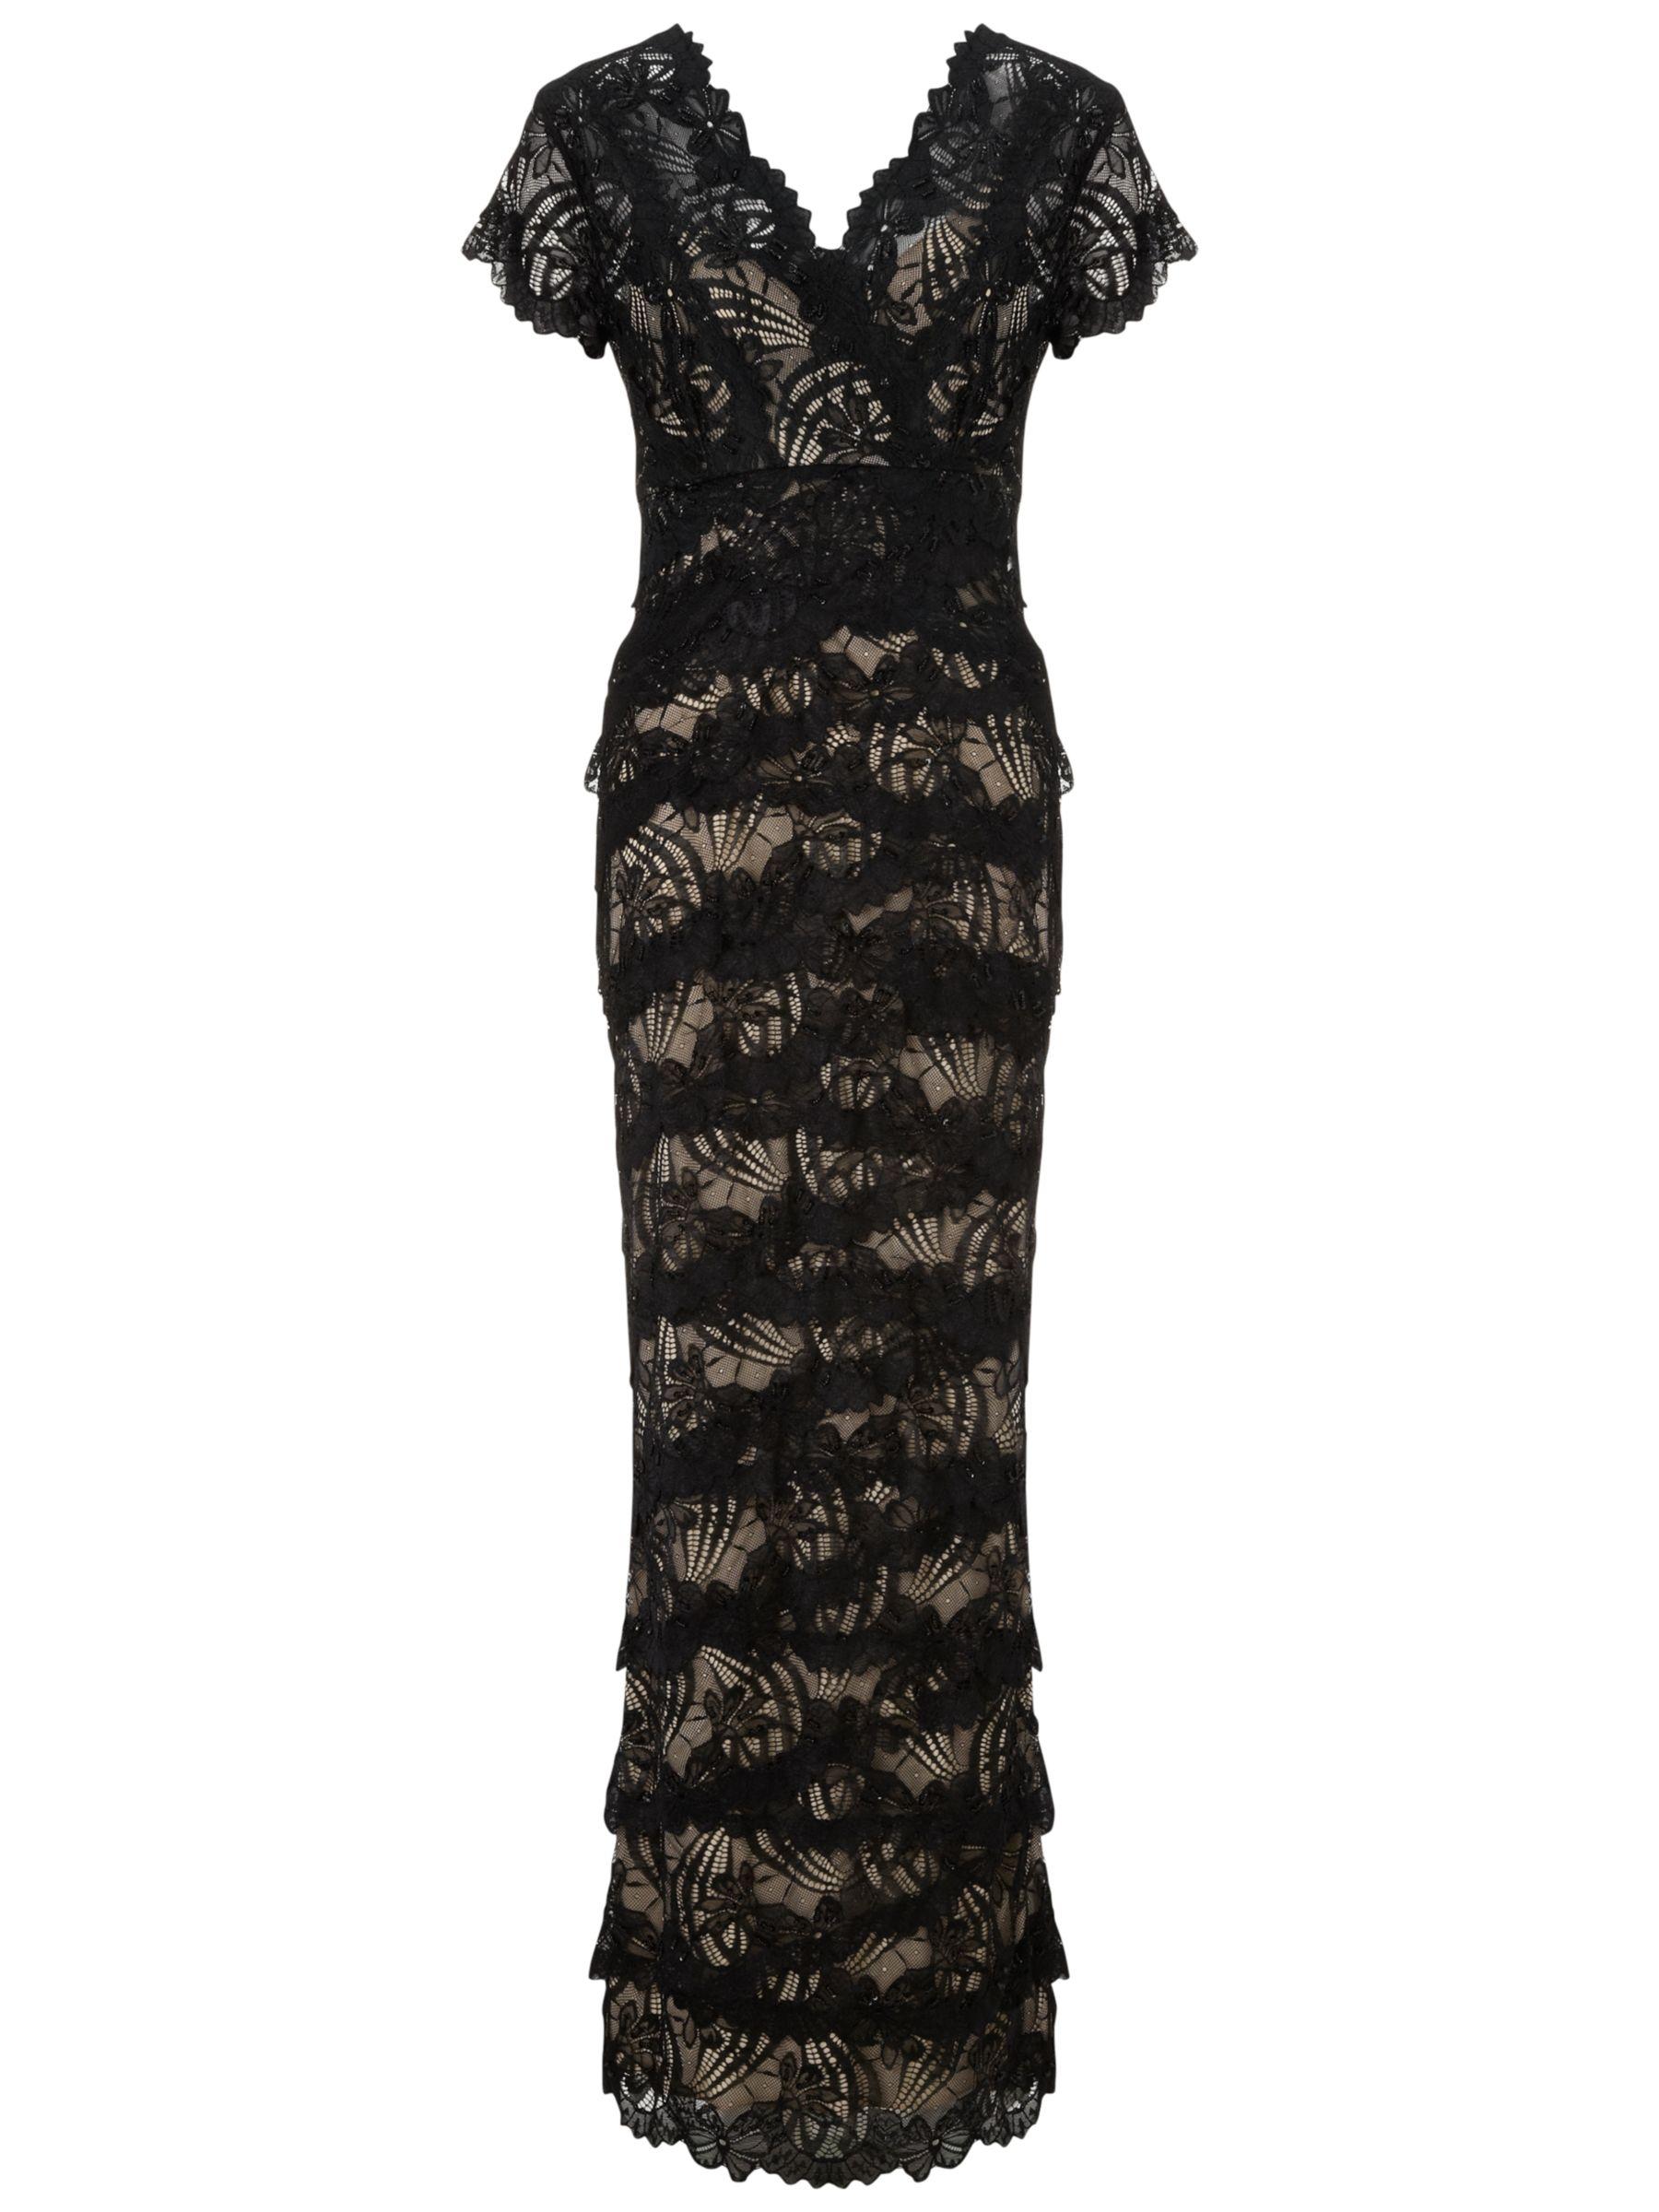 Gina Bacconi Long Beaded Lace Dress, Black/Beige